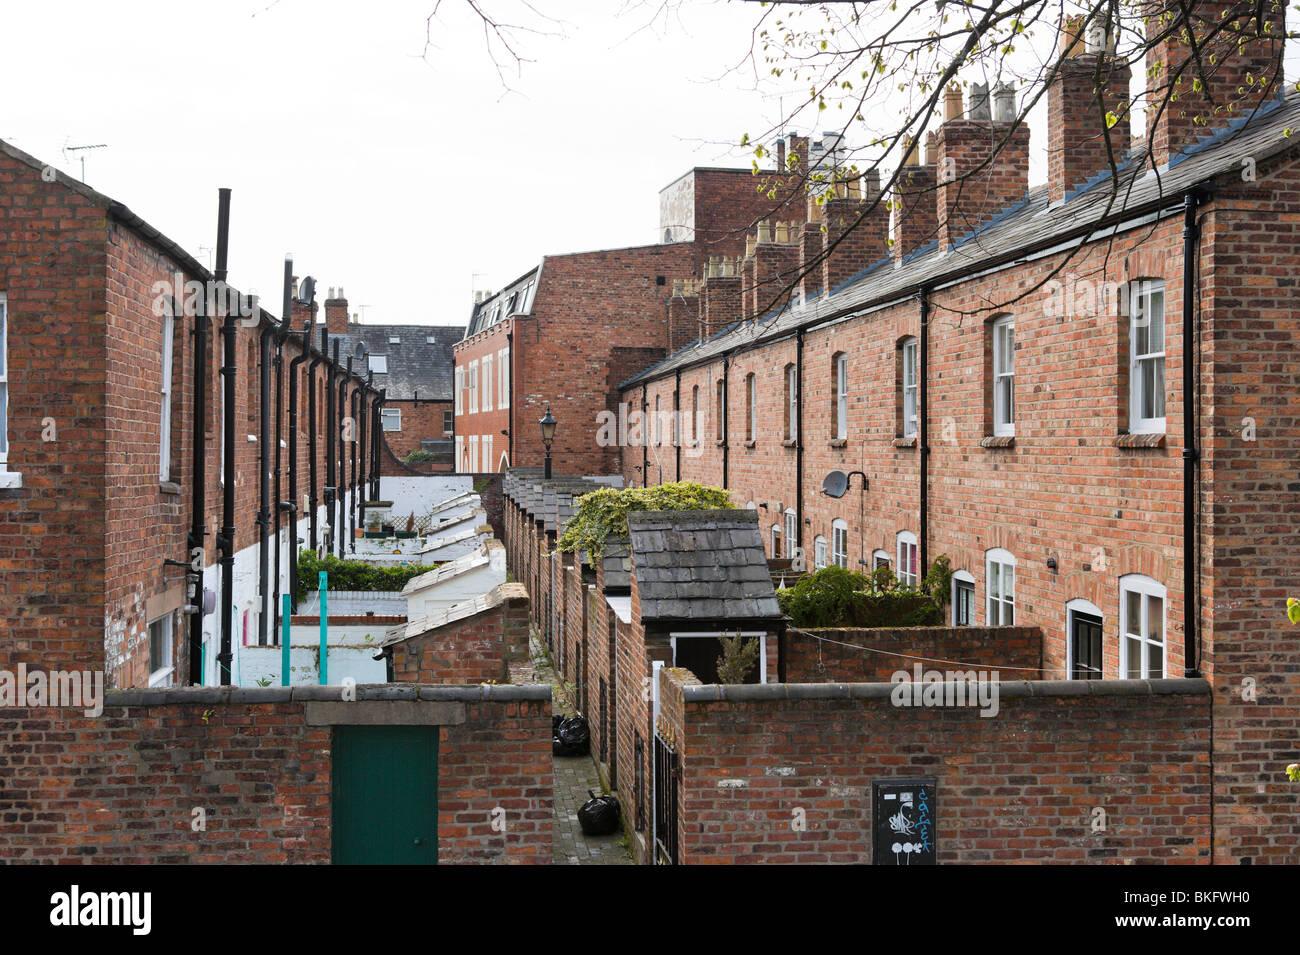 Reihen von Reihenhäusern, Chester, Cheshire, England, UK Stockbild